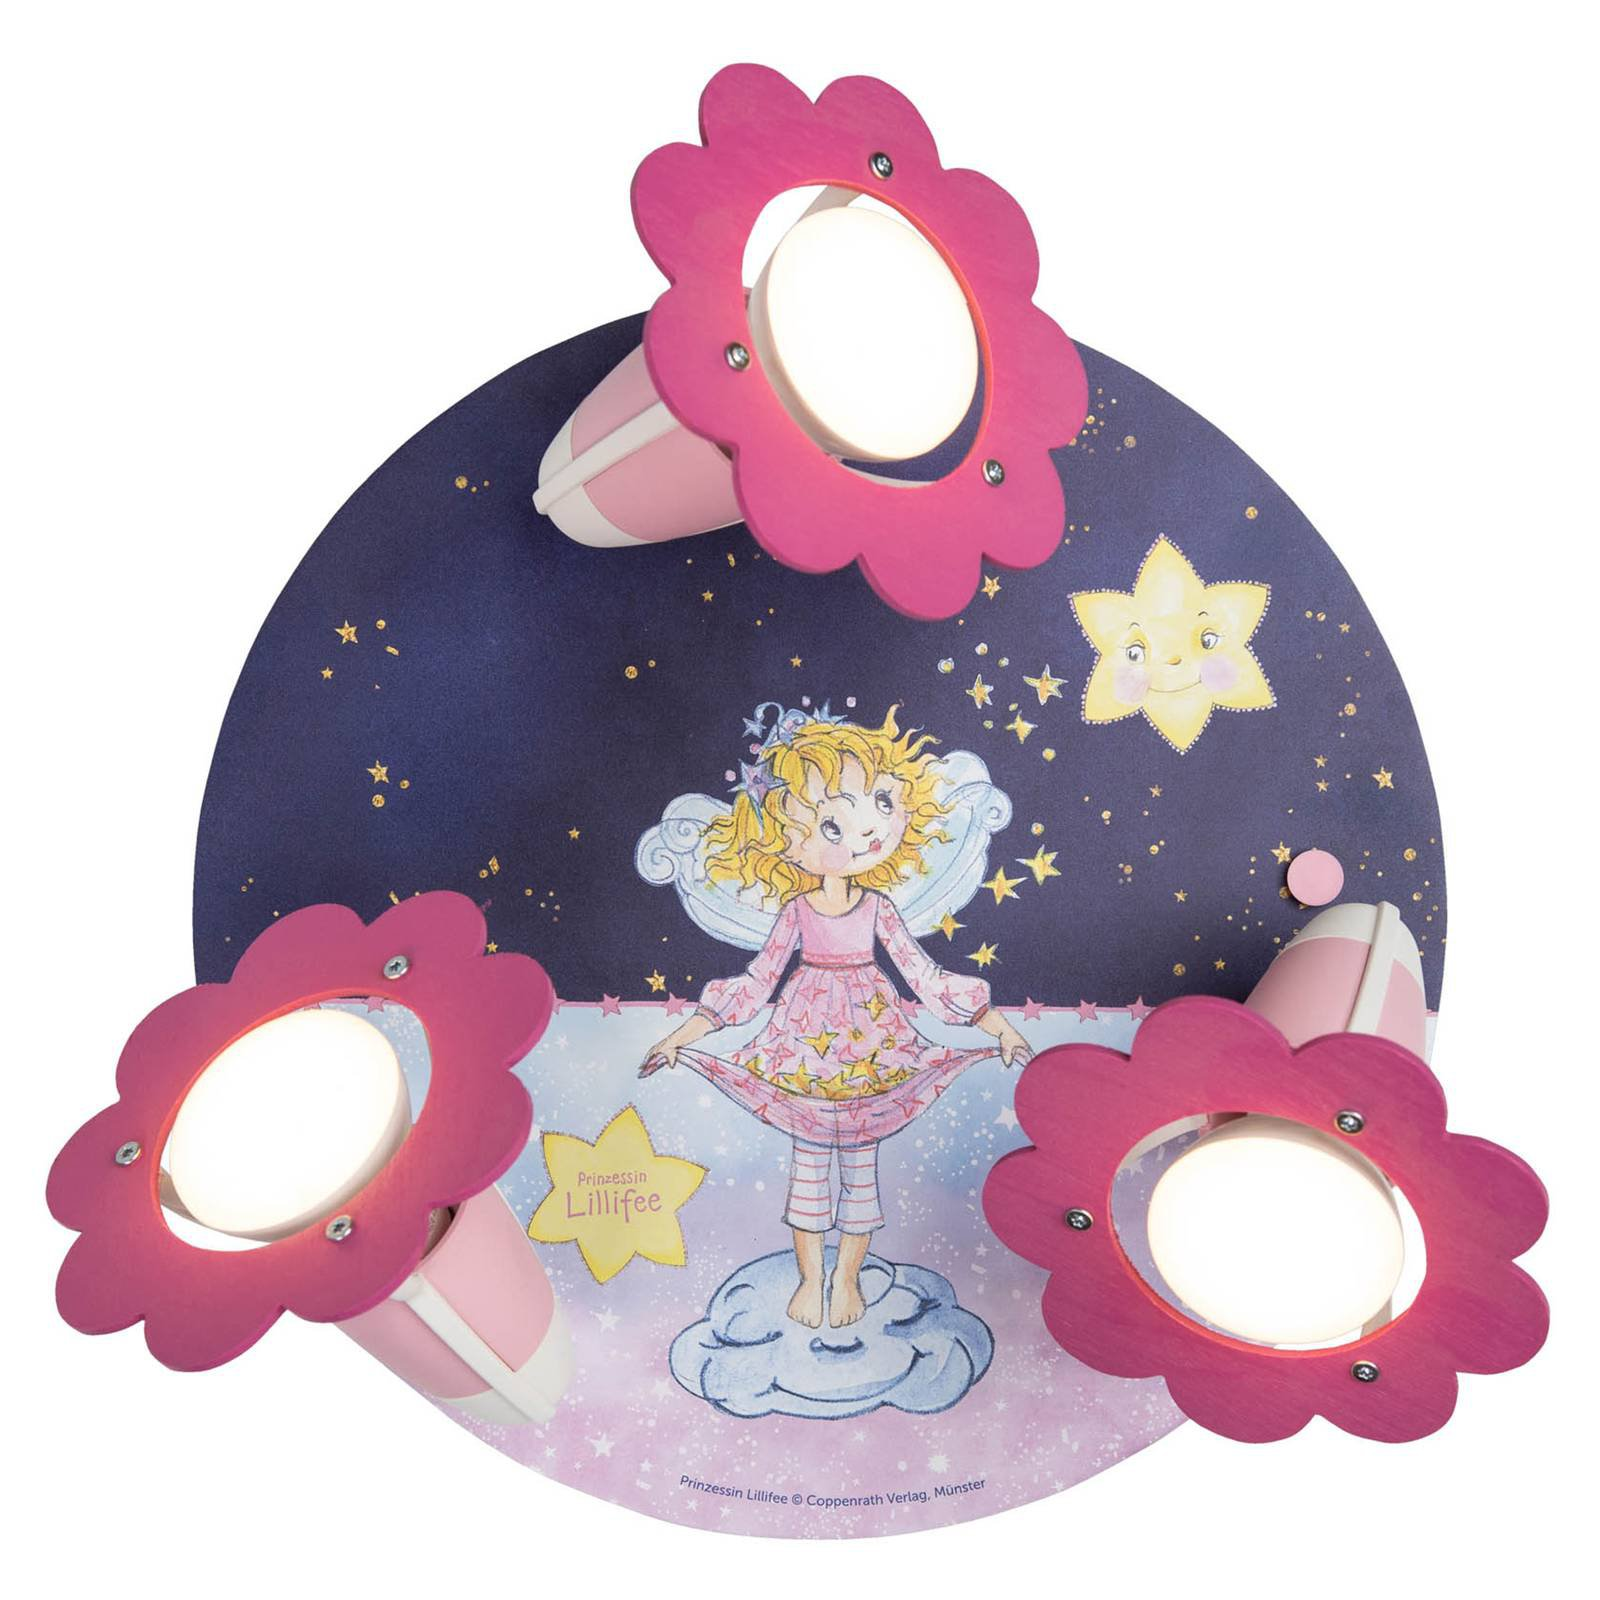 Taklampe Prinsesse Lillifee, stjerner